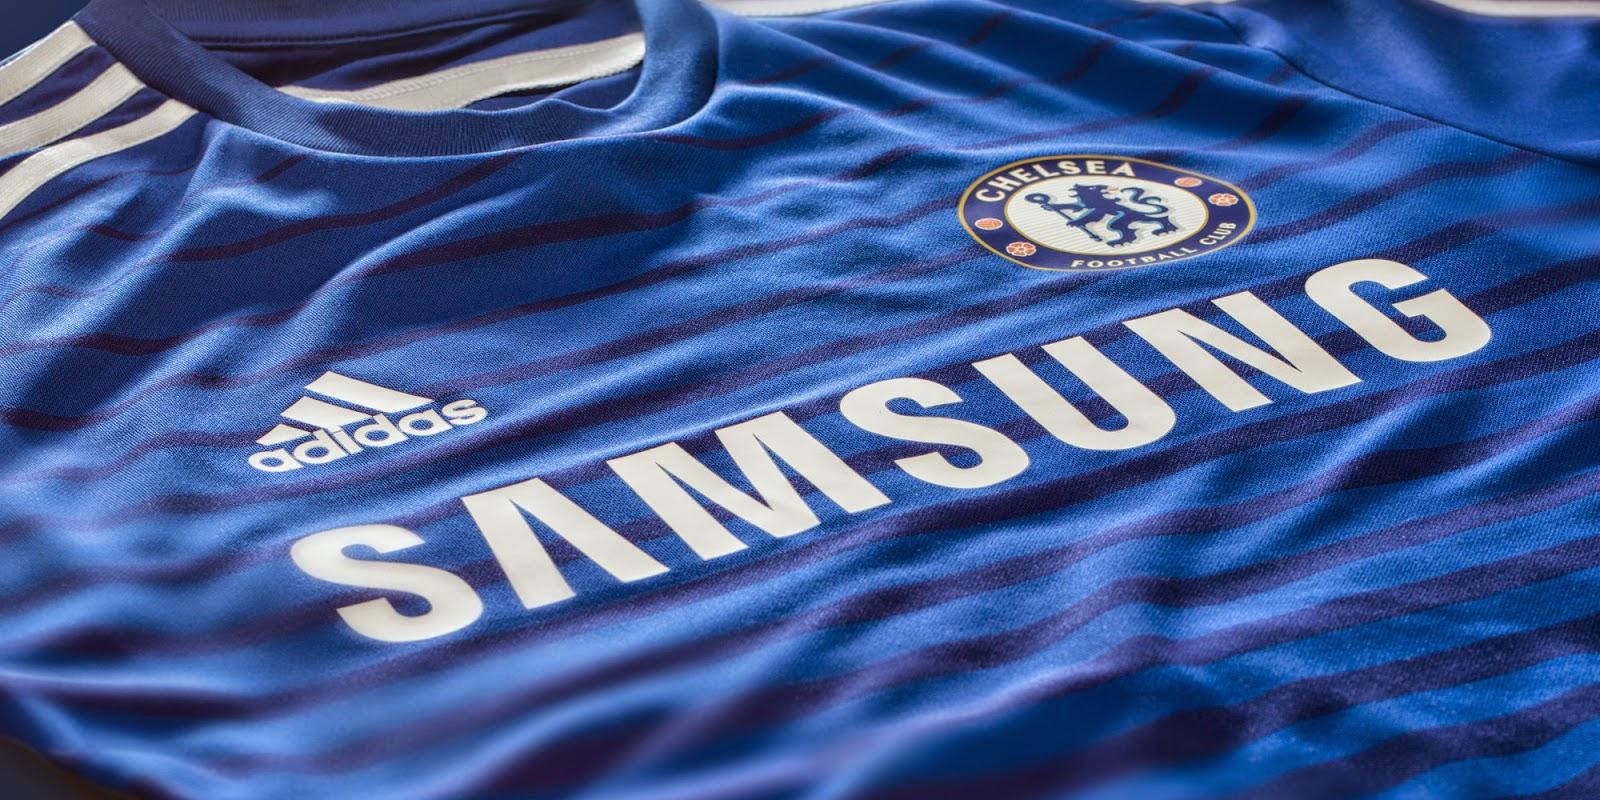 Inilah Kunci Sukses Chelsea Musim Ini Menurut Cesar Azpilicueta